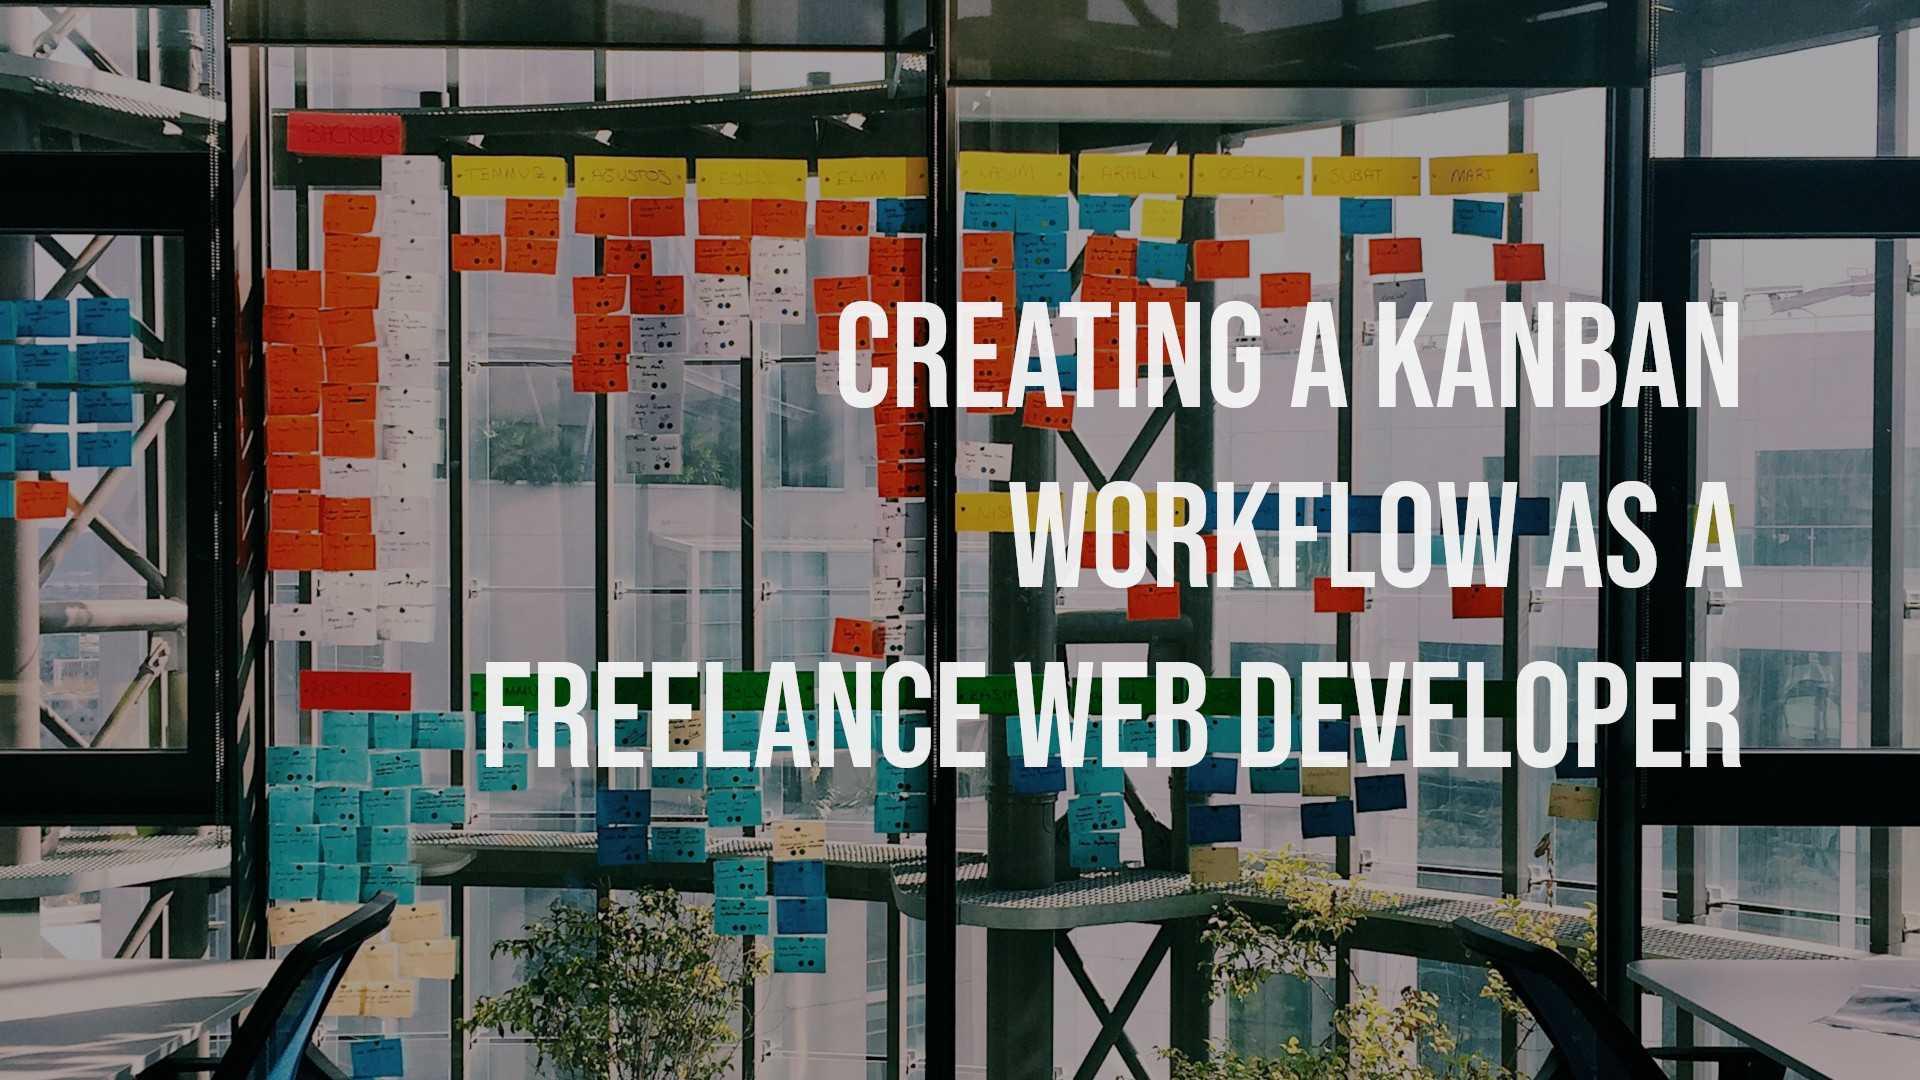 Creating A Kanban Workflow As A Freelance Web Developer